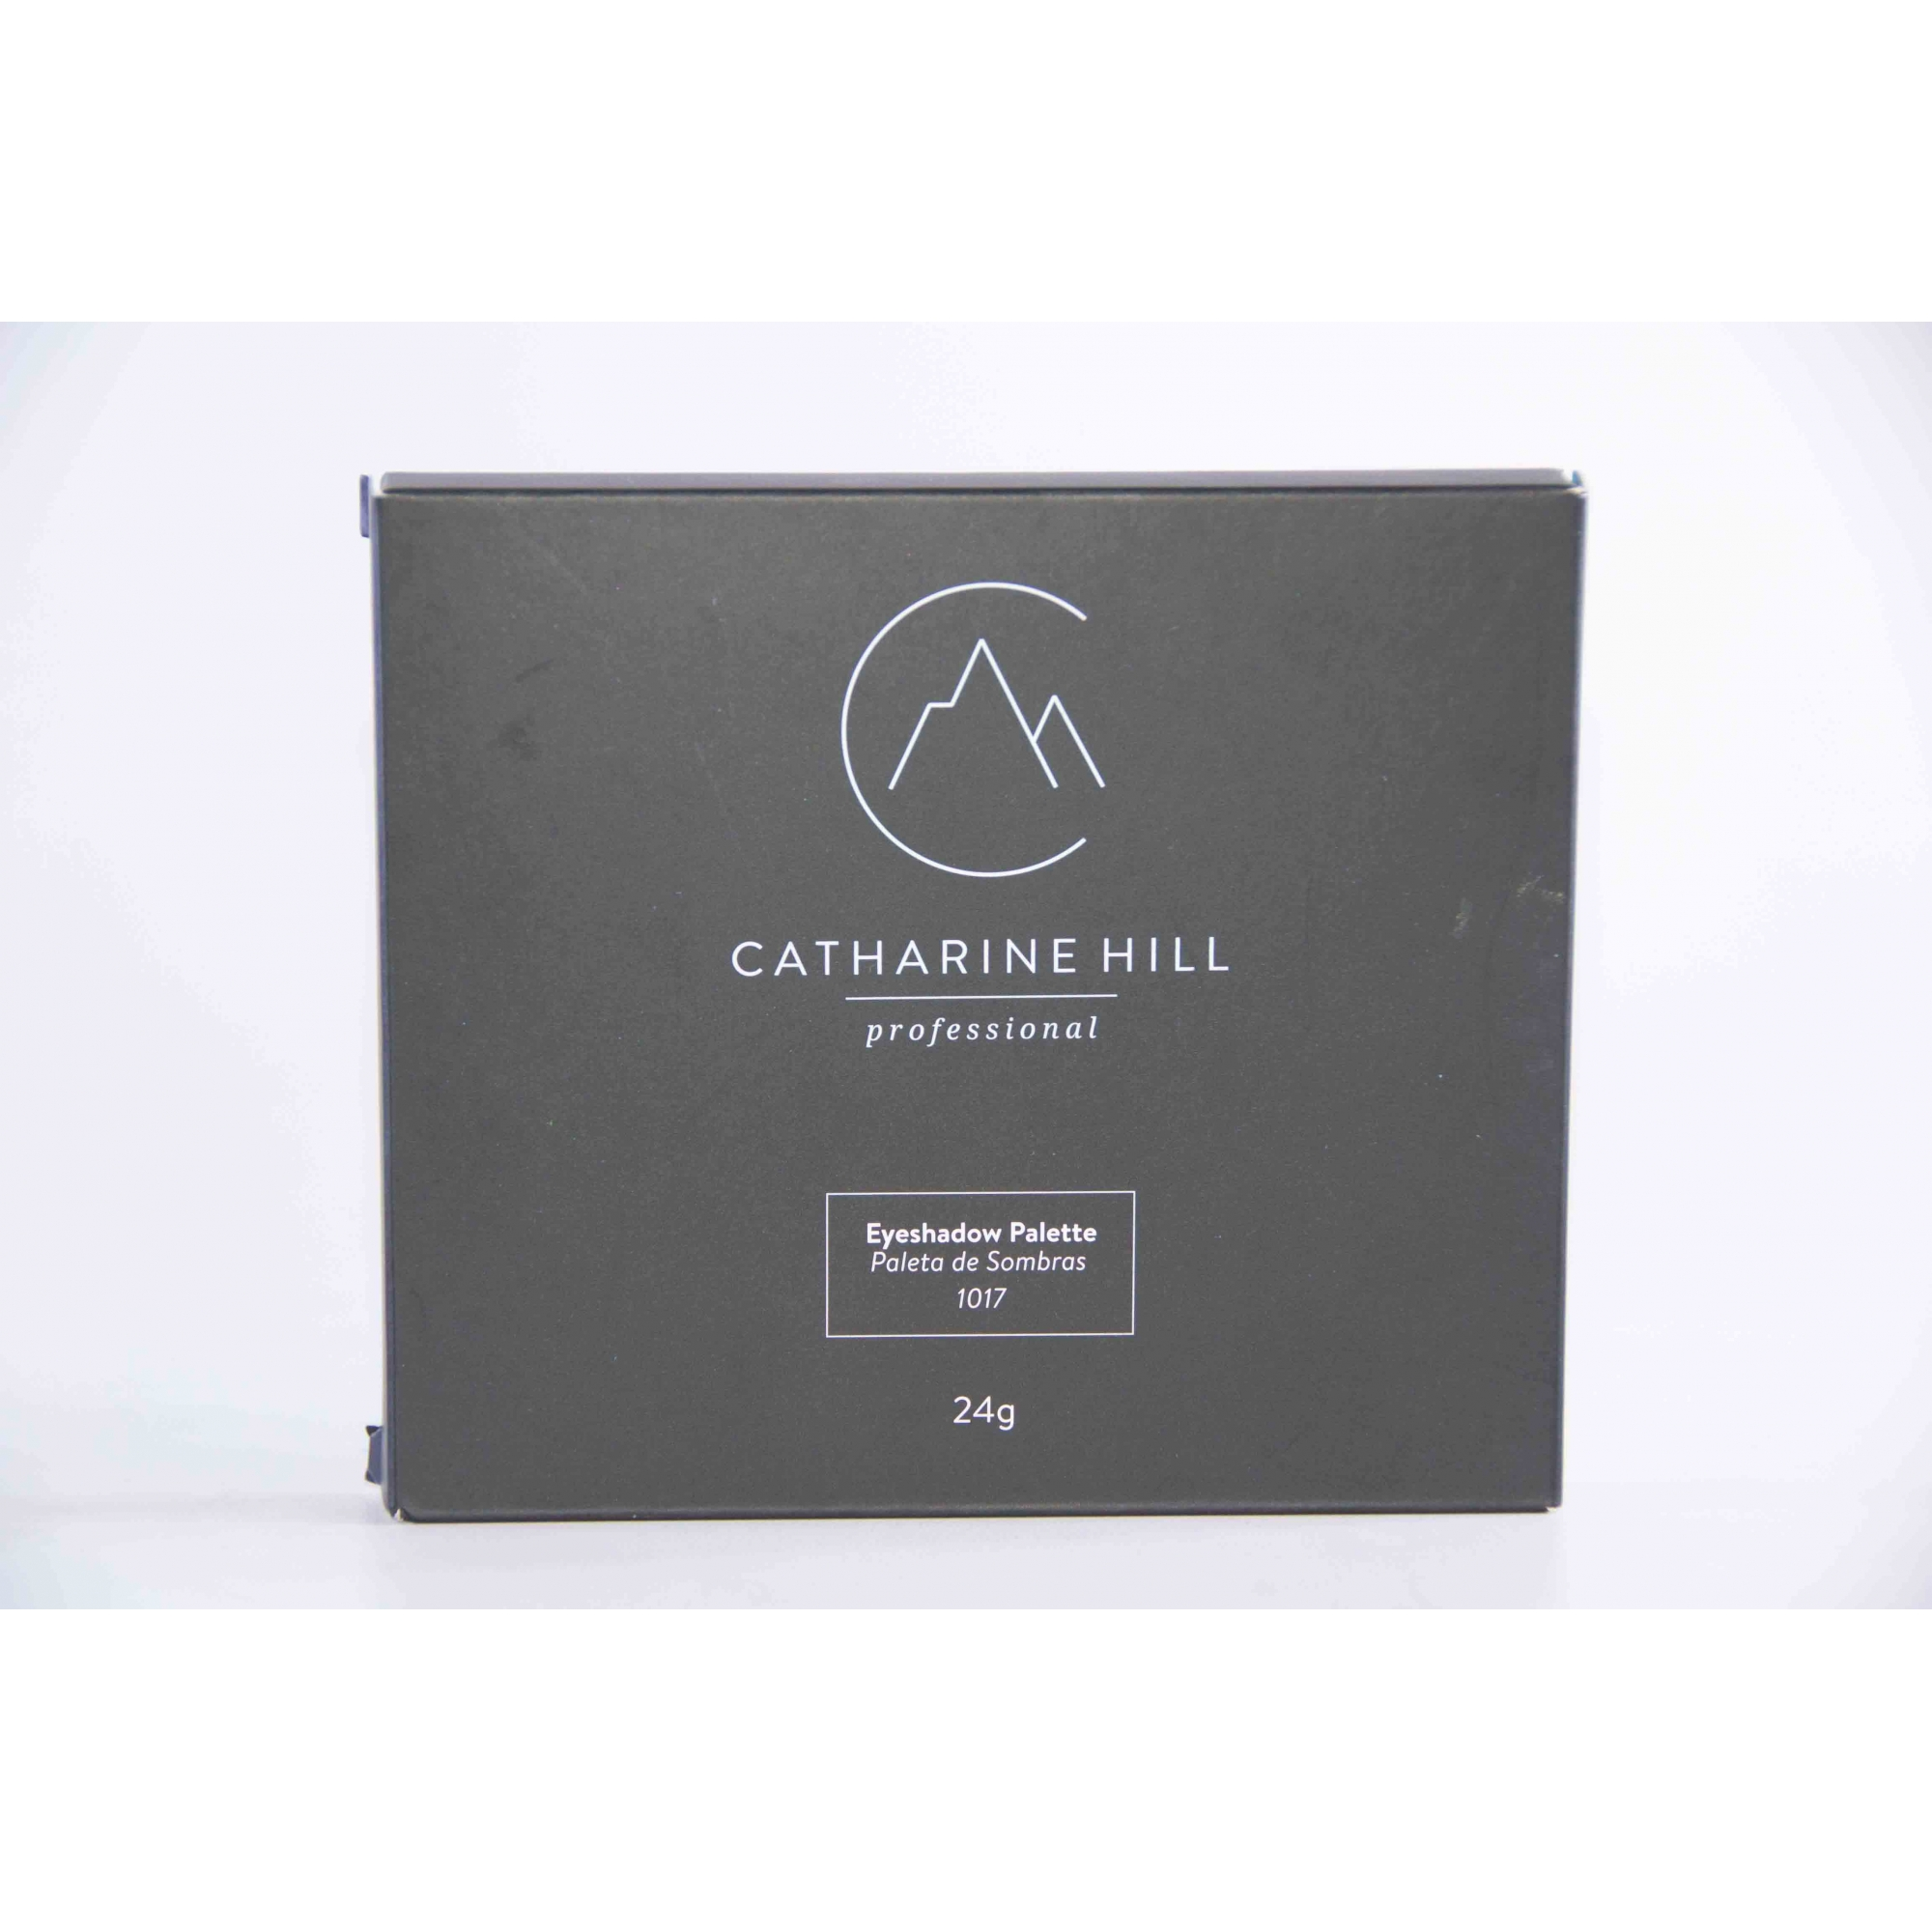 Paleta De Sombras 1017 - Catharine Hill